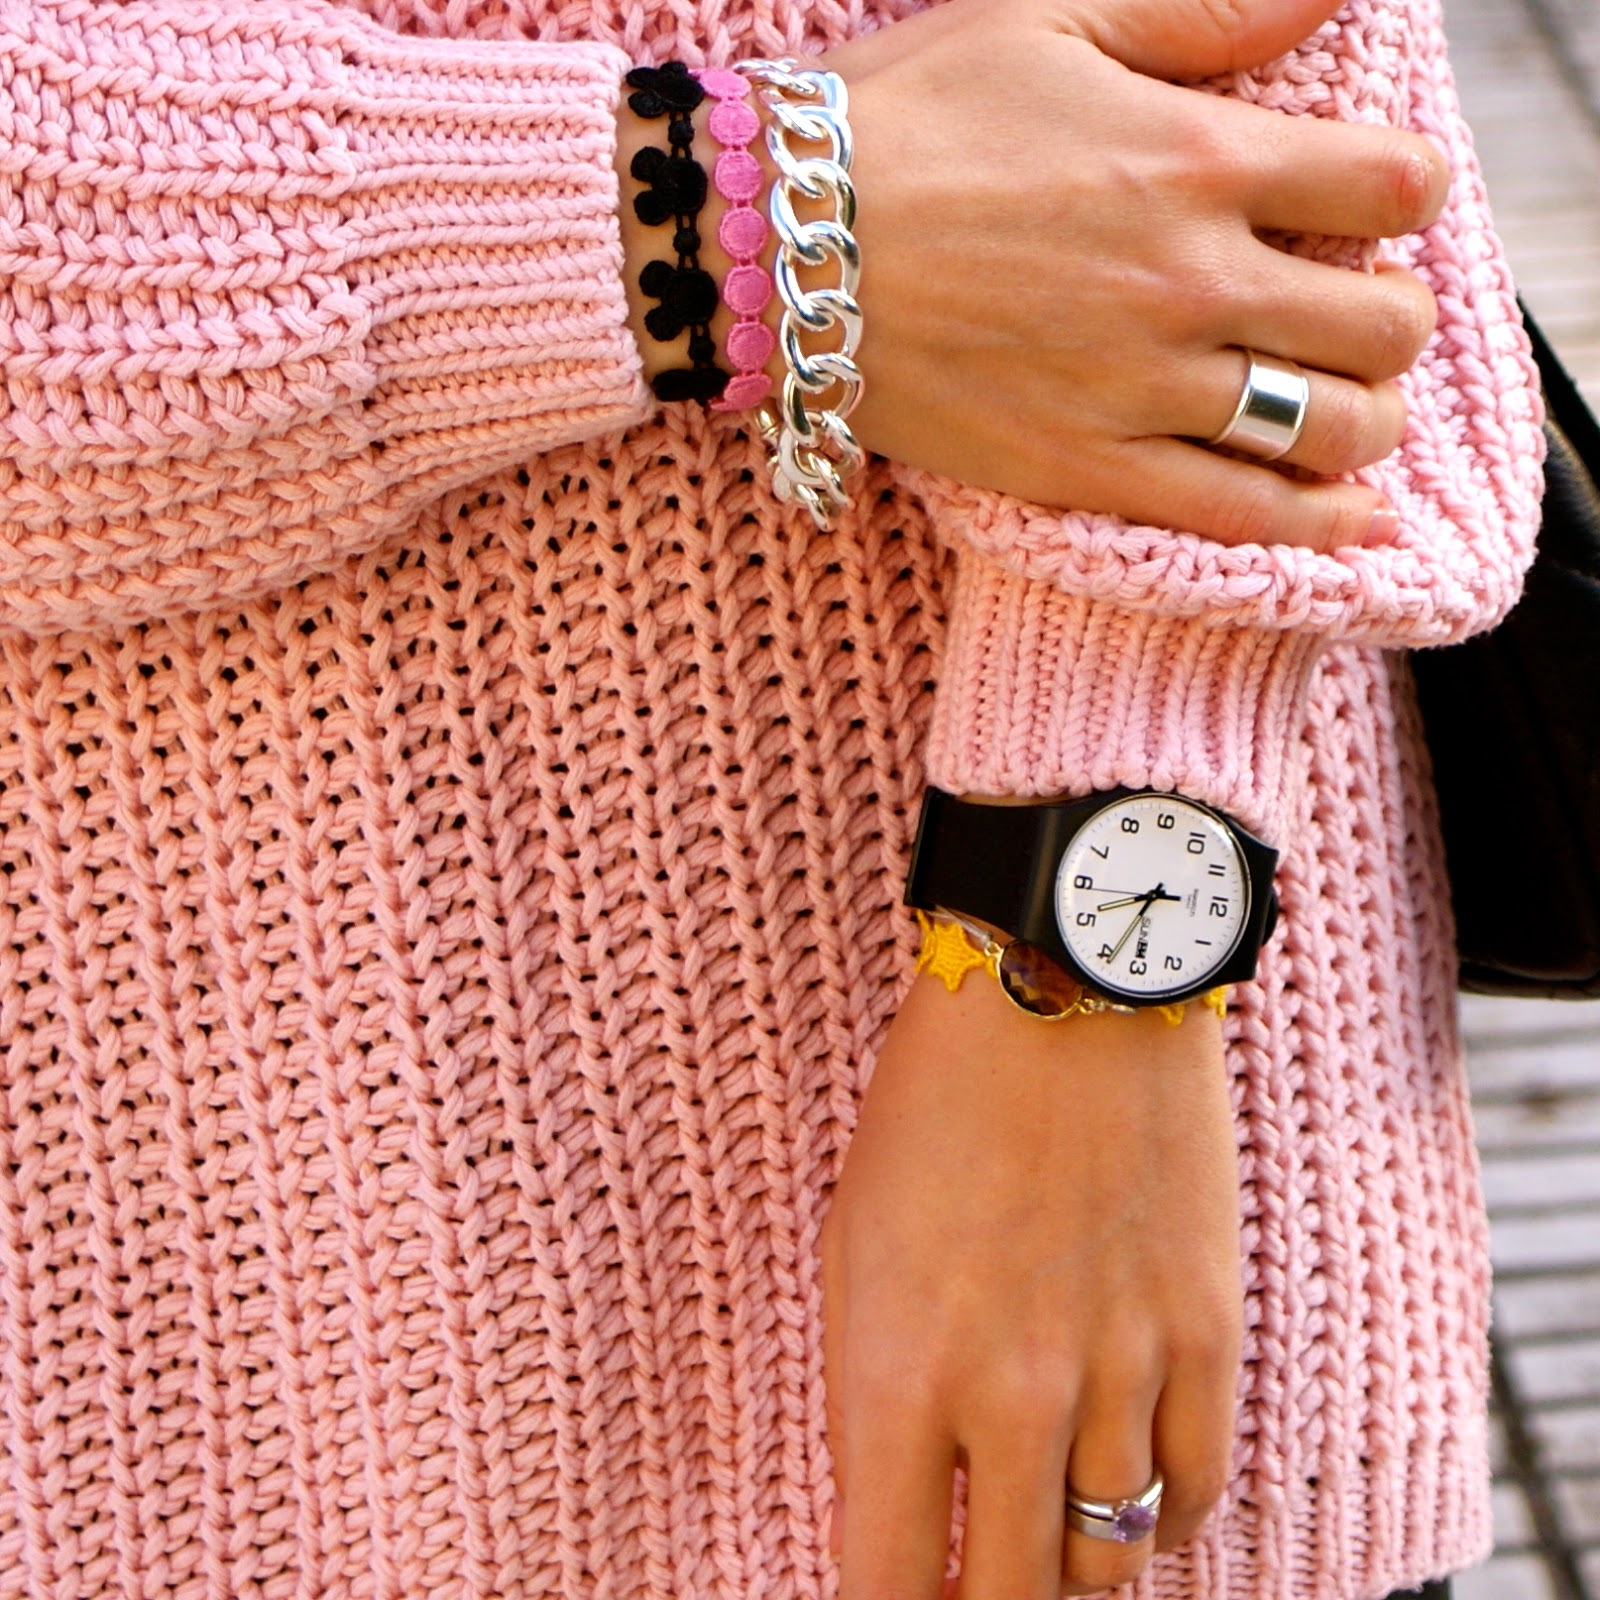 LaCaprichossa - StreetStyle - Fashion Blogger - botas de agua - mini de cuero y jersey - mango - swatch - cruciani C - yanes young